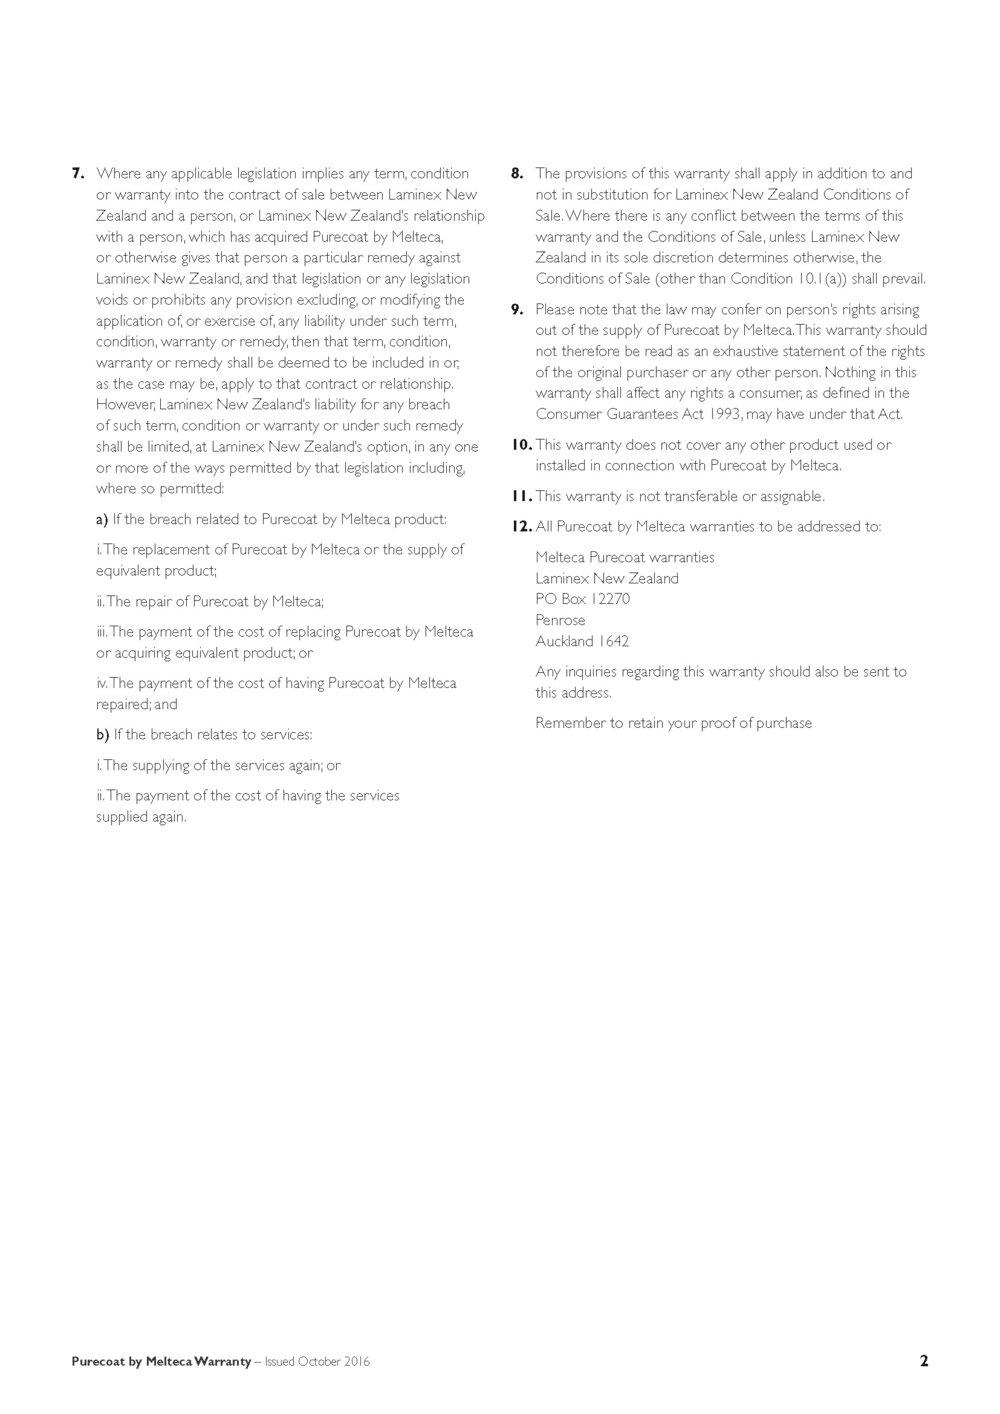 J002984_LAMI_Purecoat_Warranty_v1_LR_Page_2.jpg